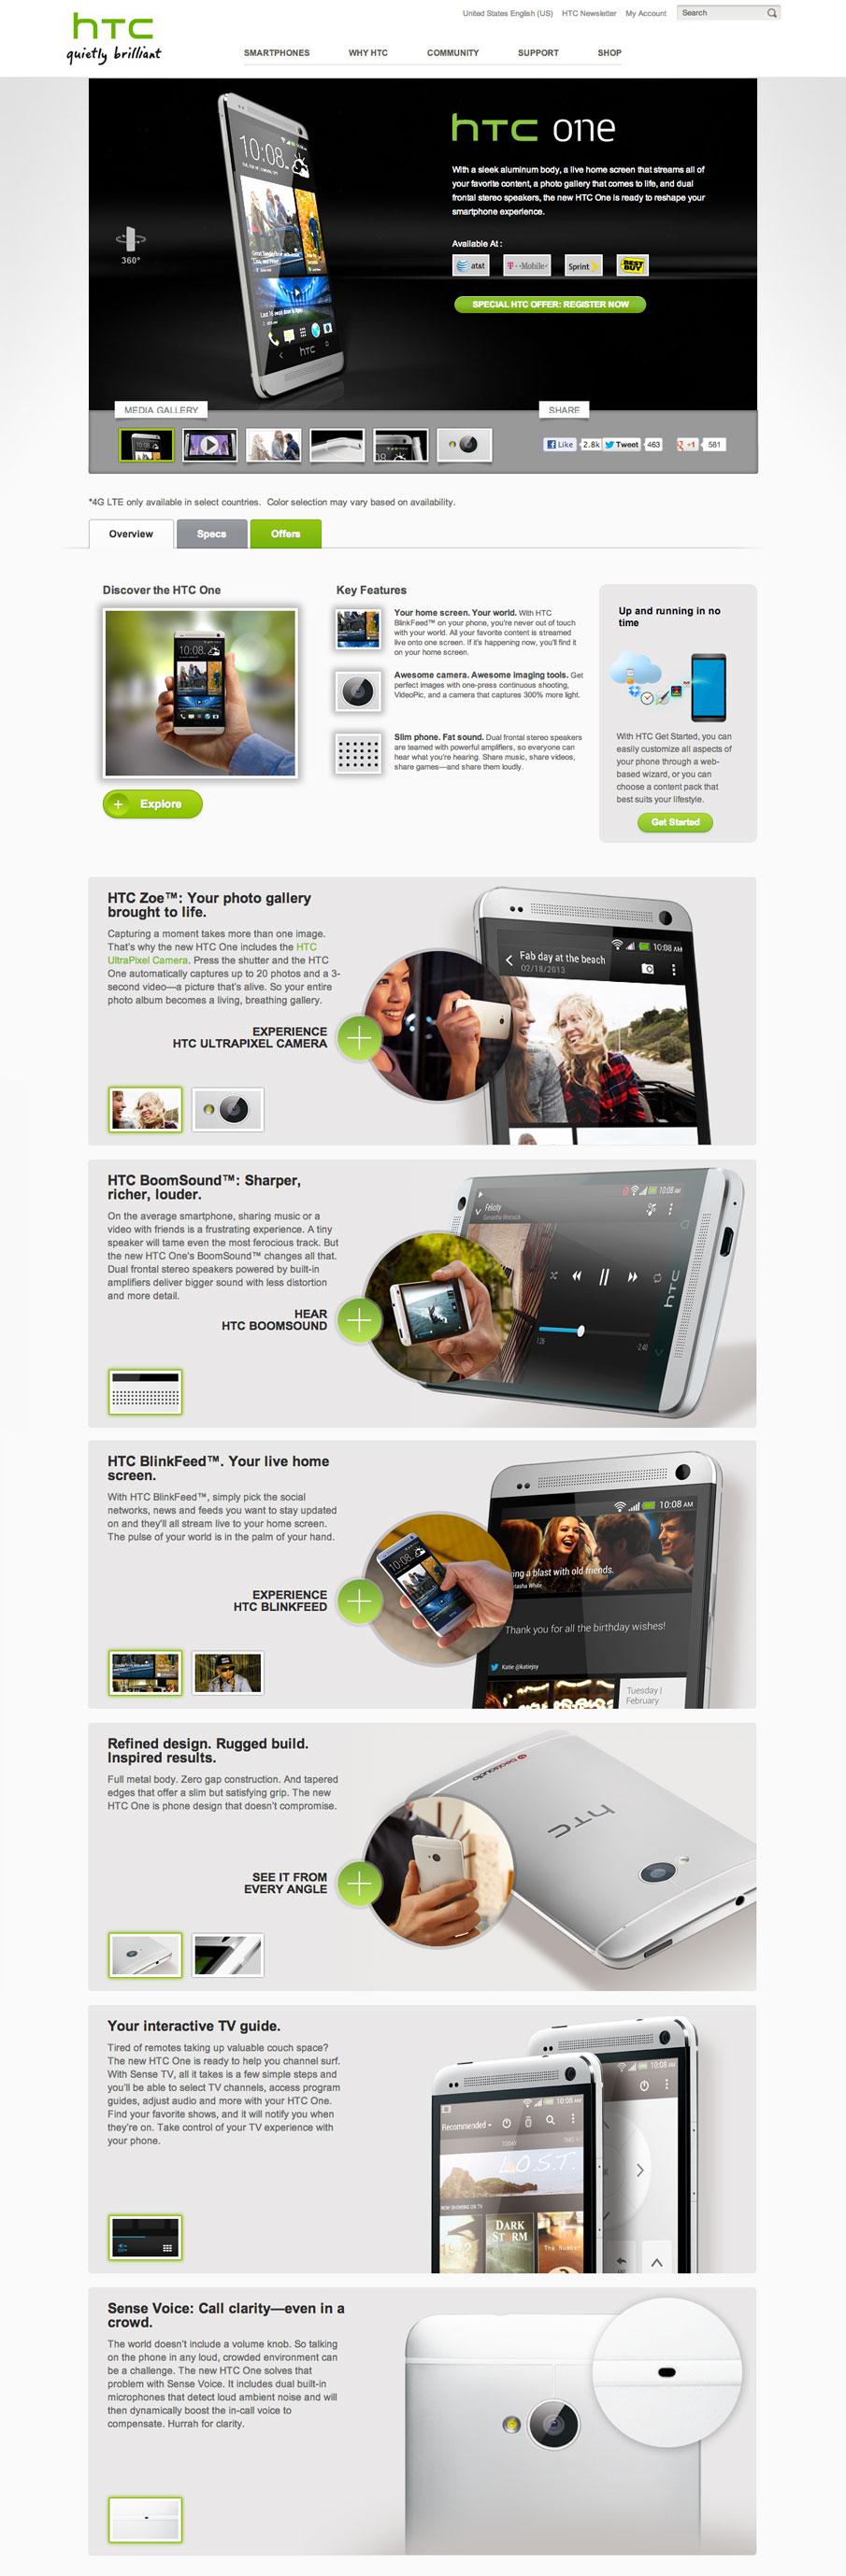 HTC_PP_A_905.jpg